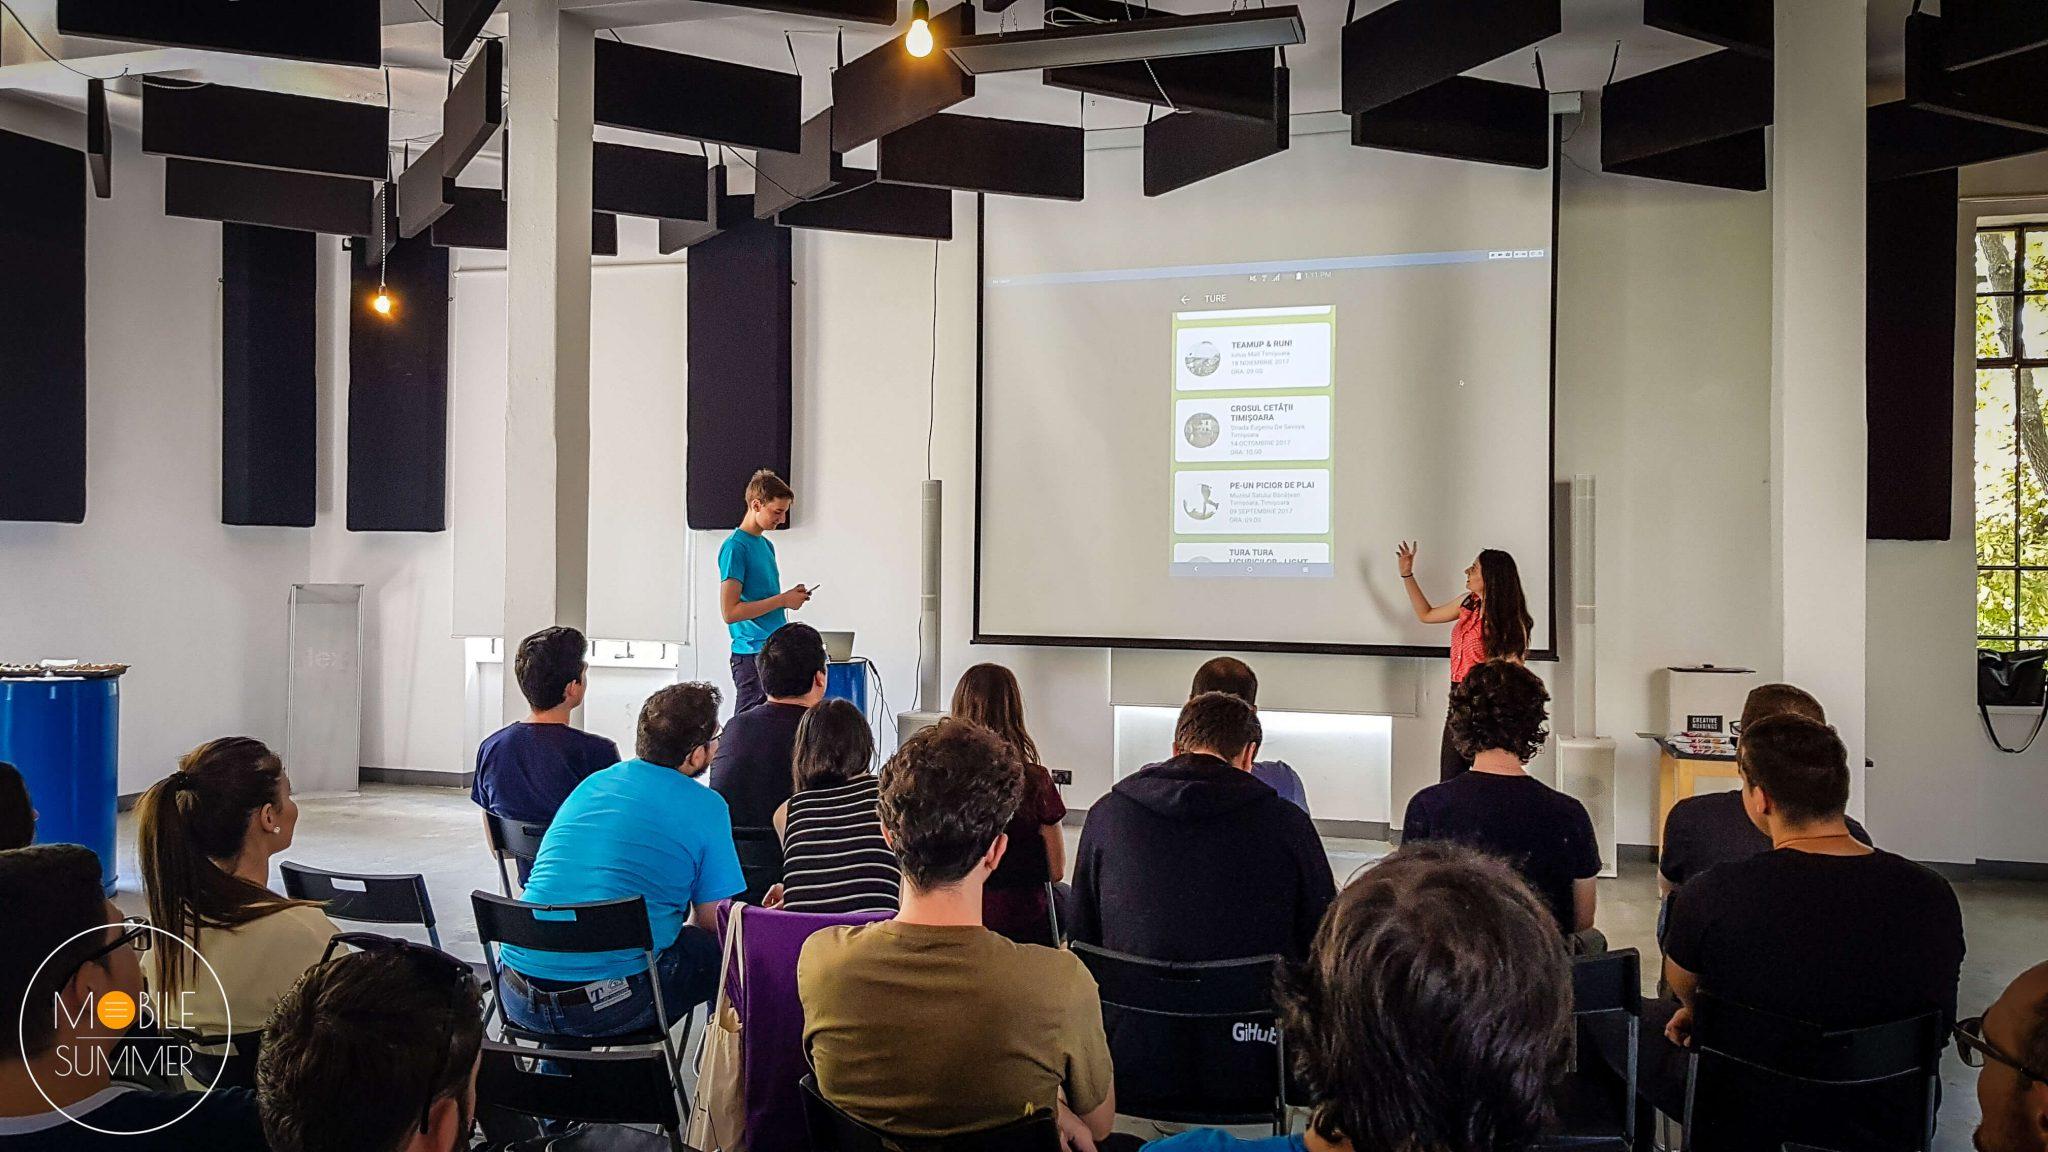 Mobile Summer 4.0 - alergotura - aplicații mobile pro bono